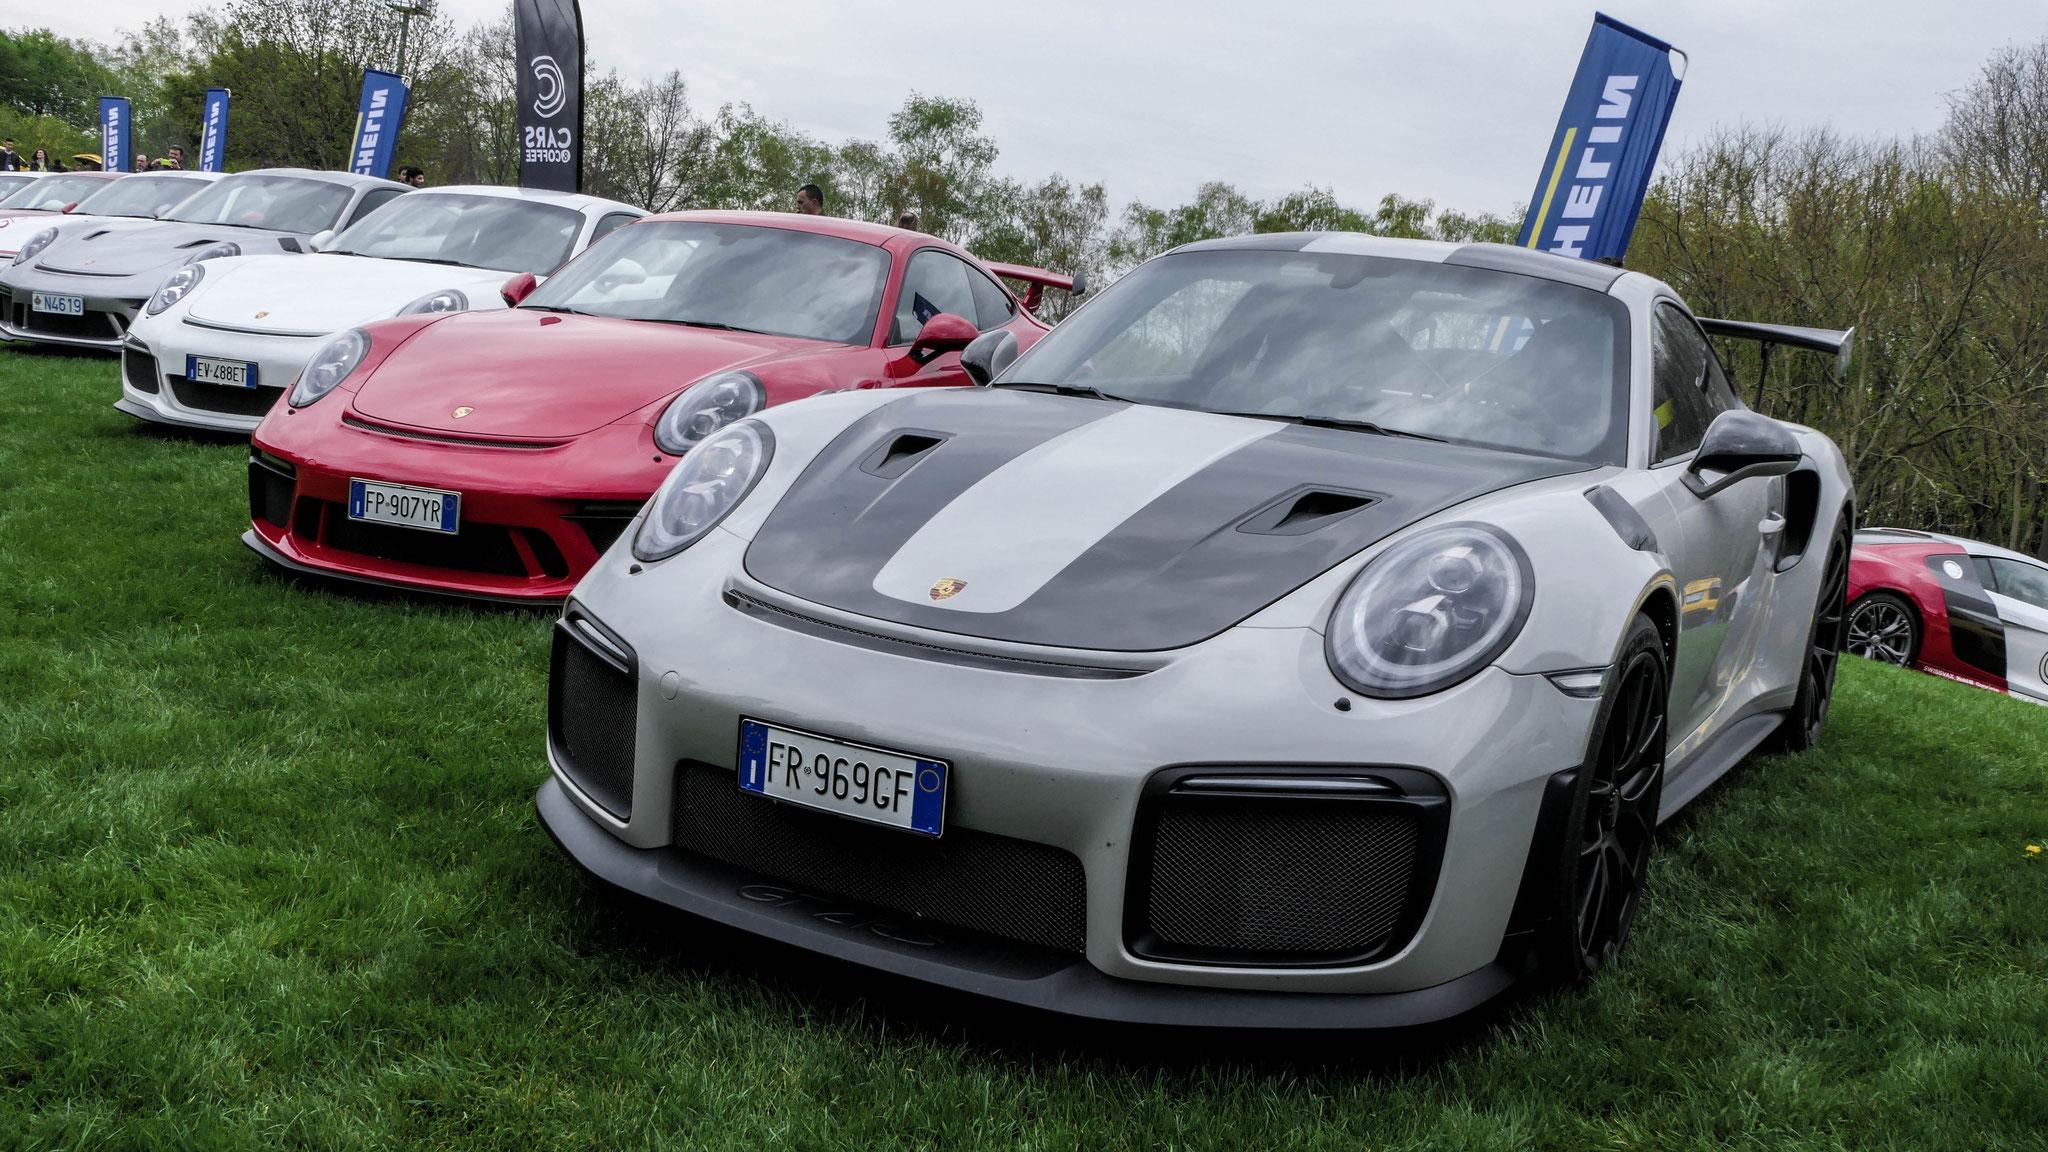 Porsche 911 GT2 RS - FR-969-GF (ITA)